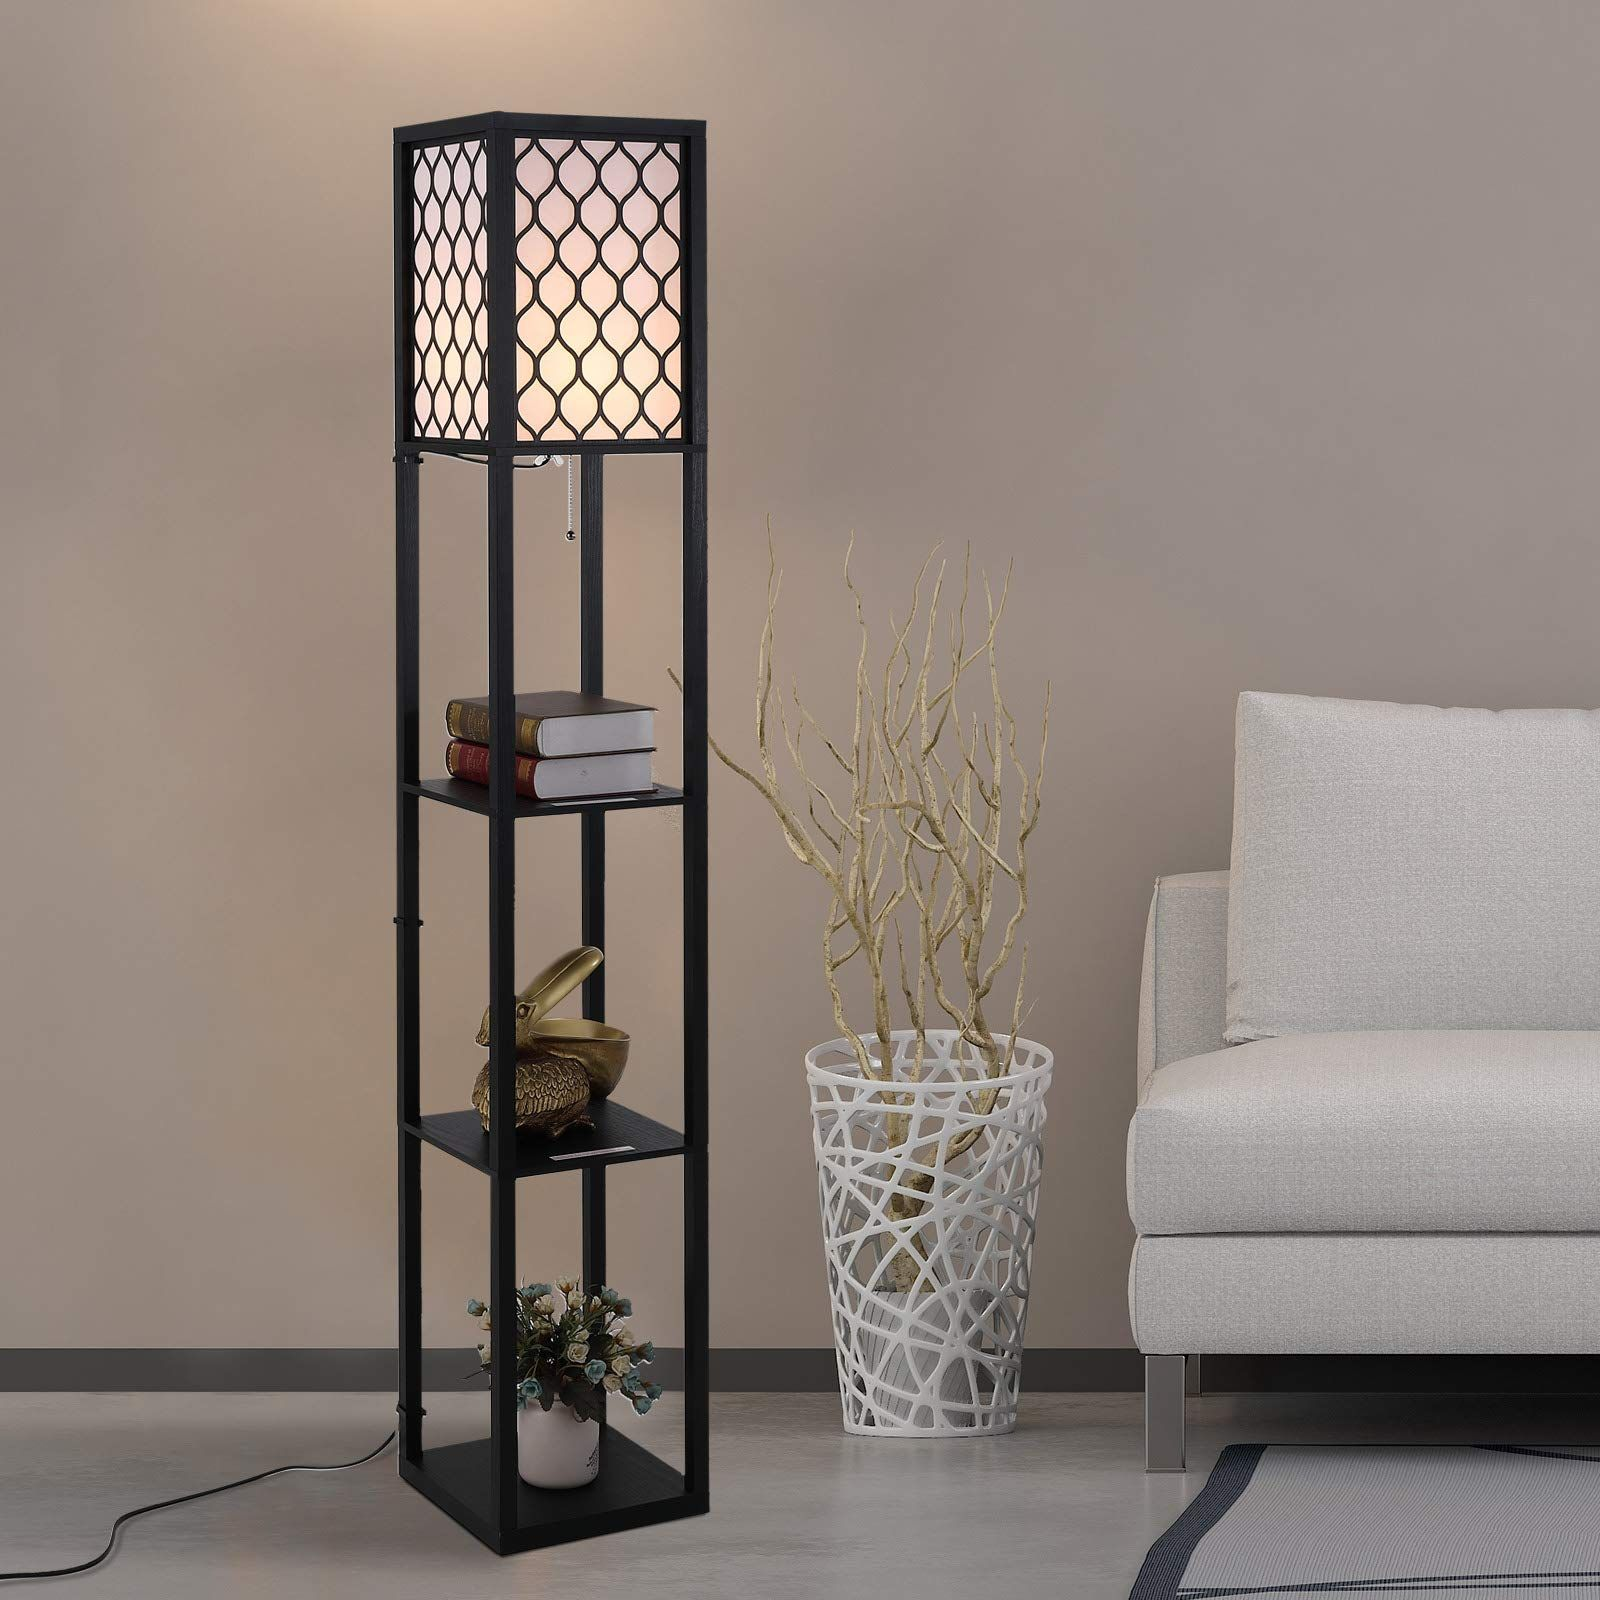 Wooden Modern Shelf Floor Lamp Light with 4tier